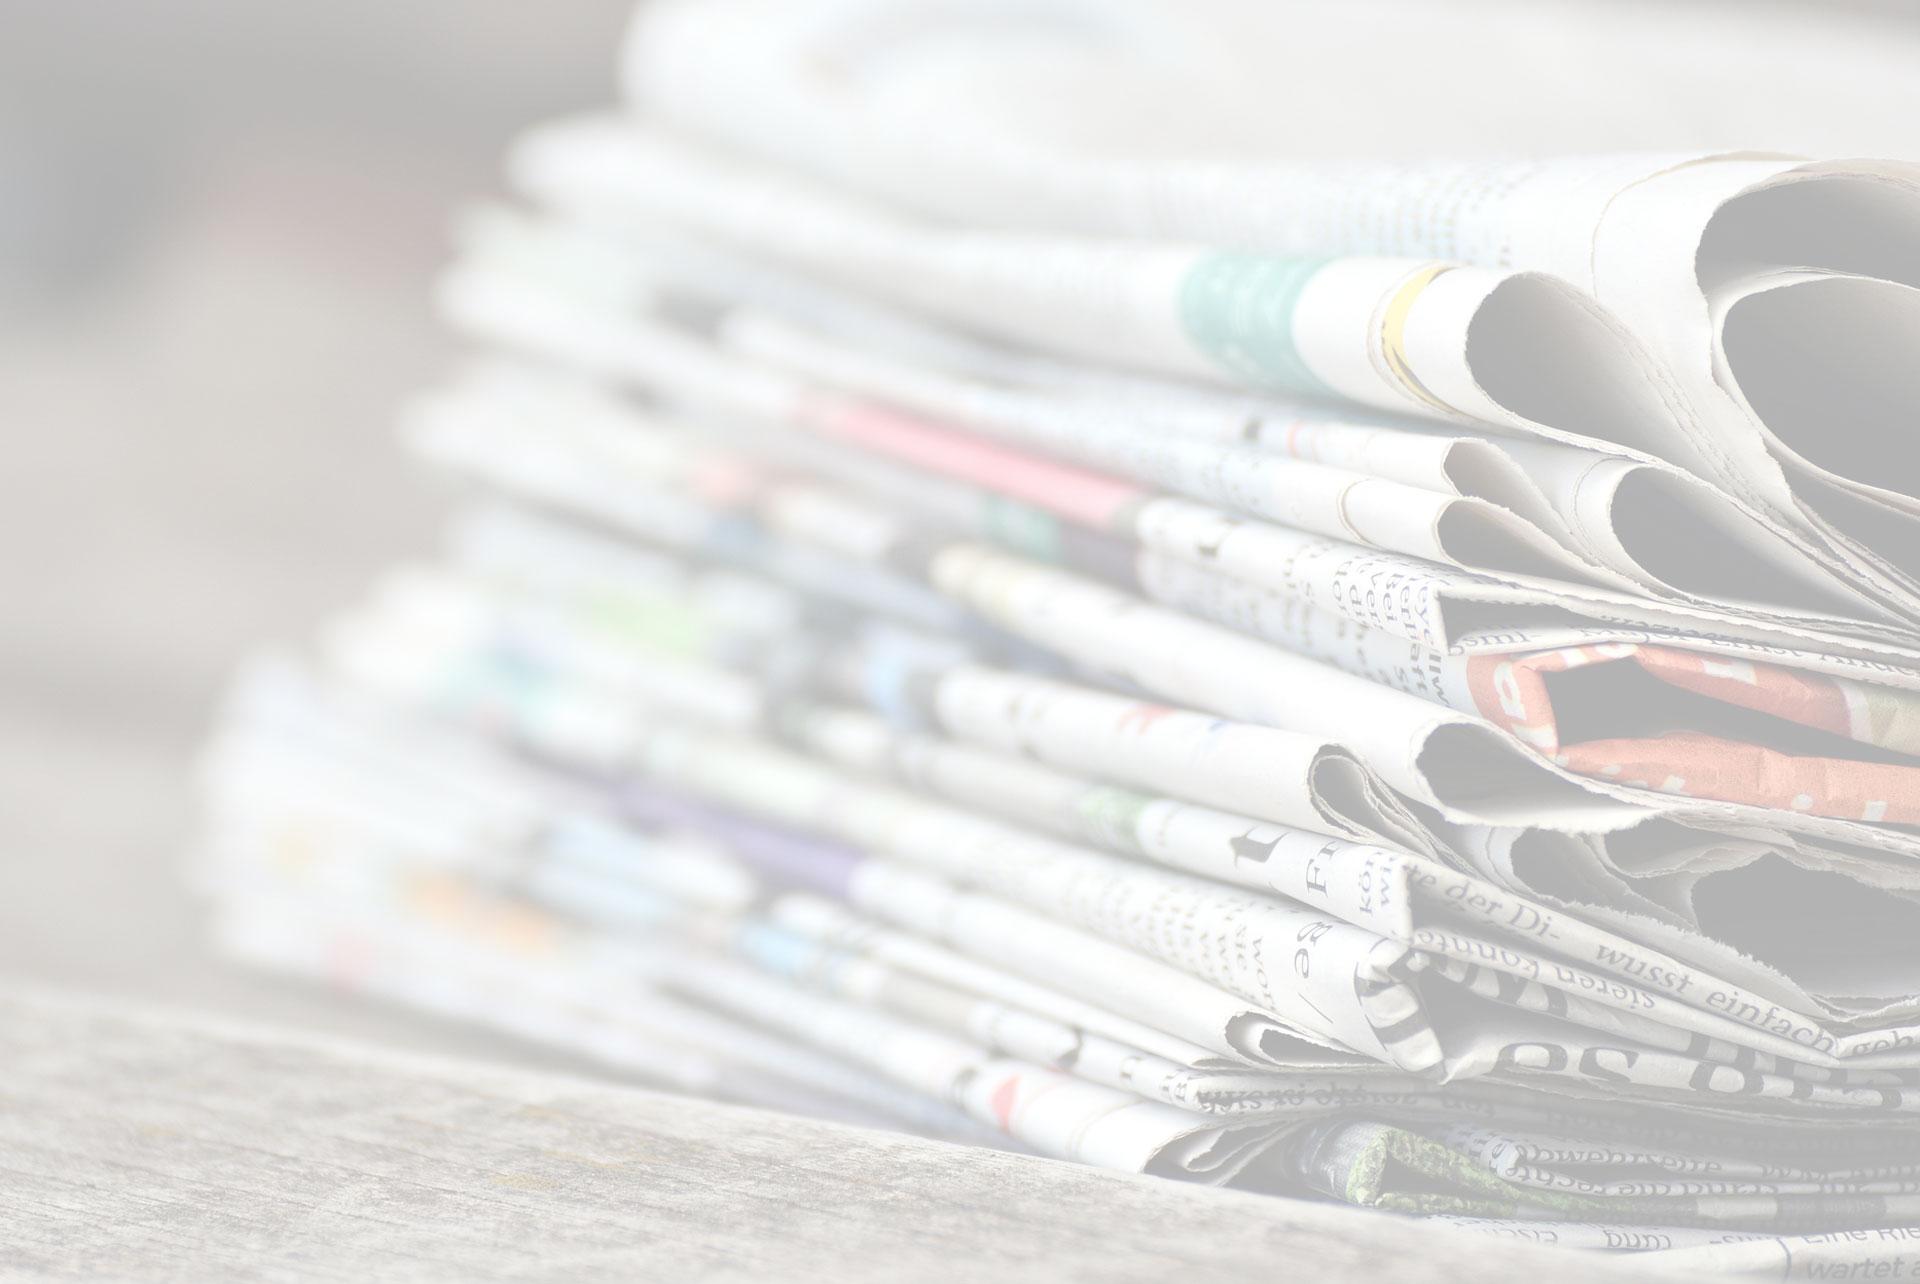 COSA PREVEDE LA LEGGE ANTITRUST EUROPEA